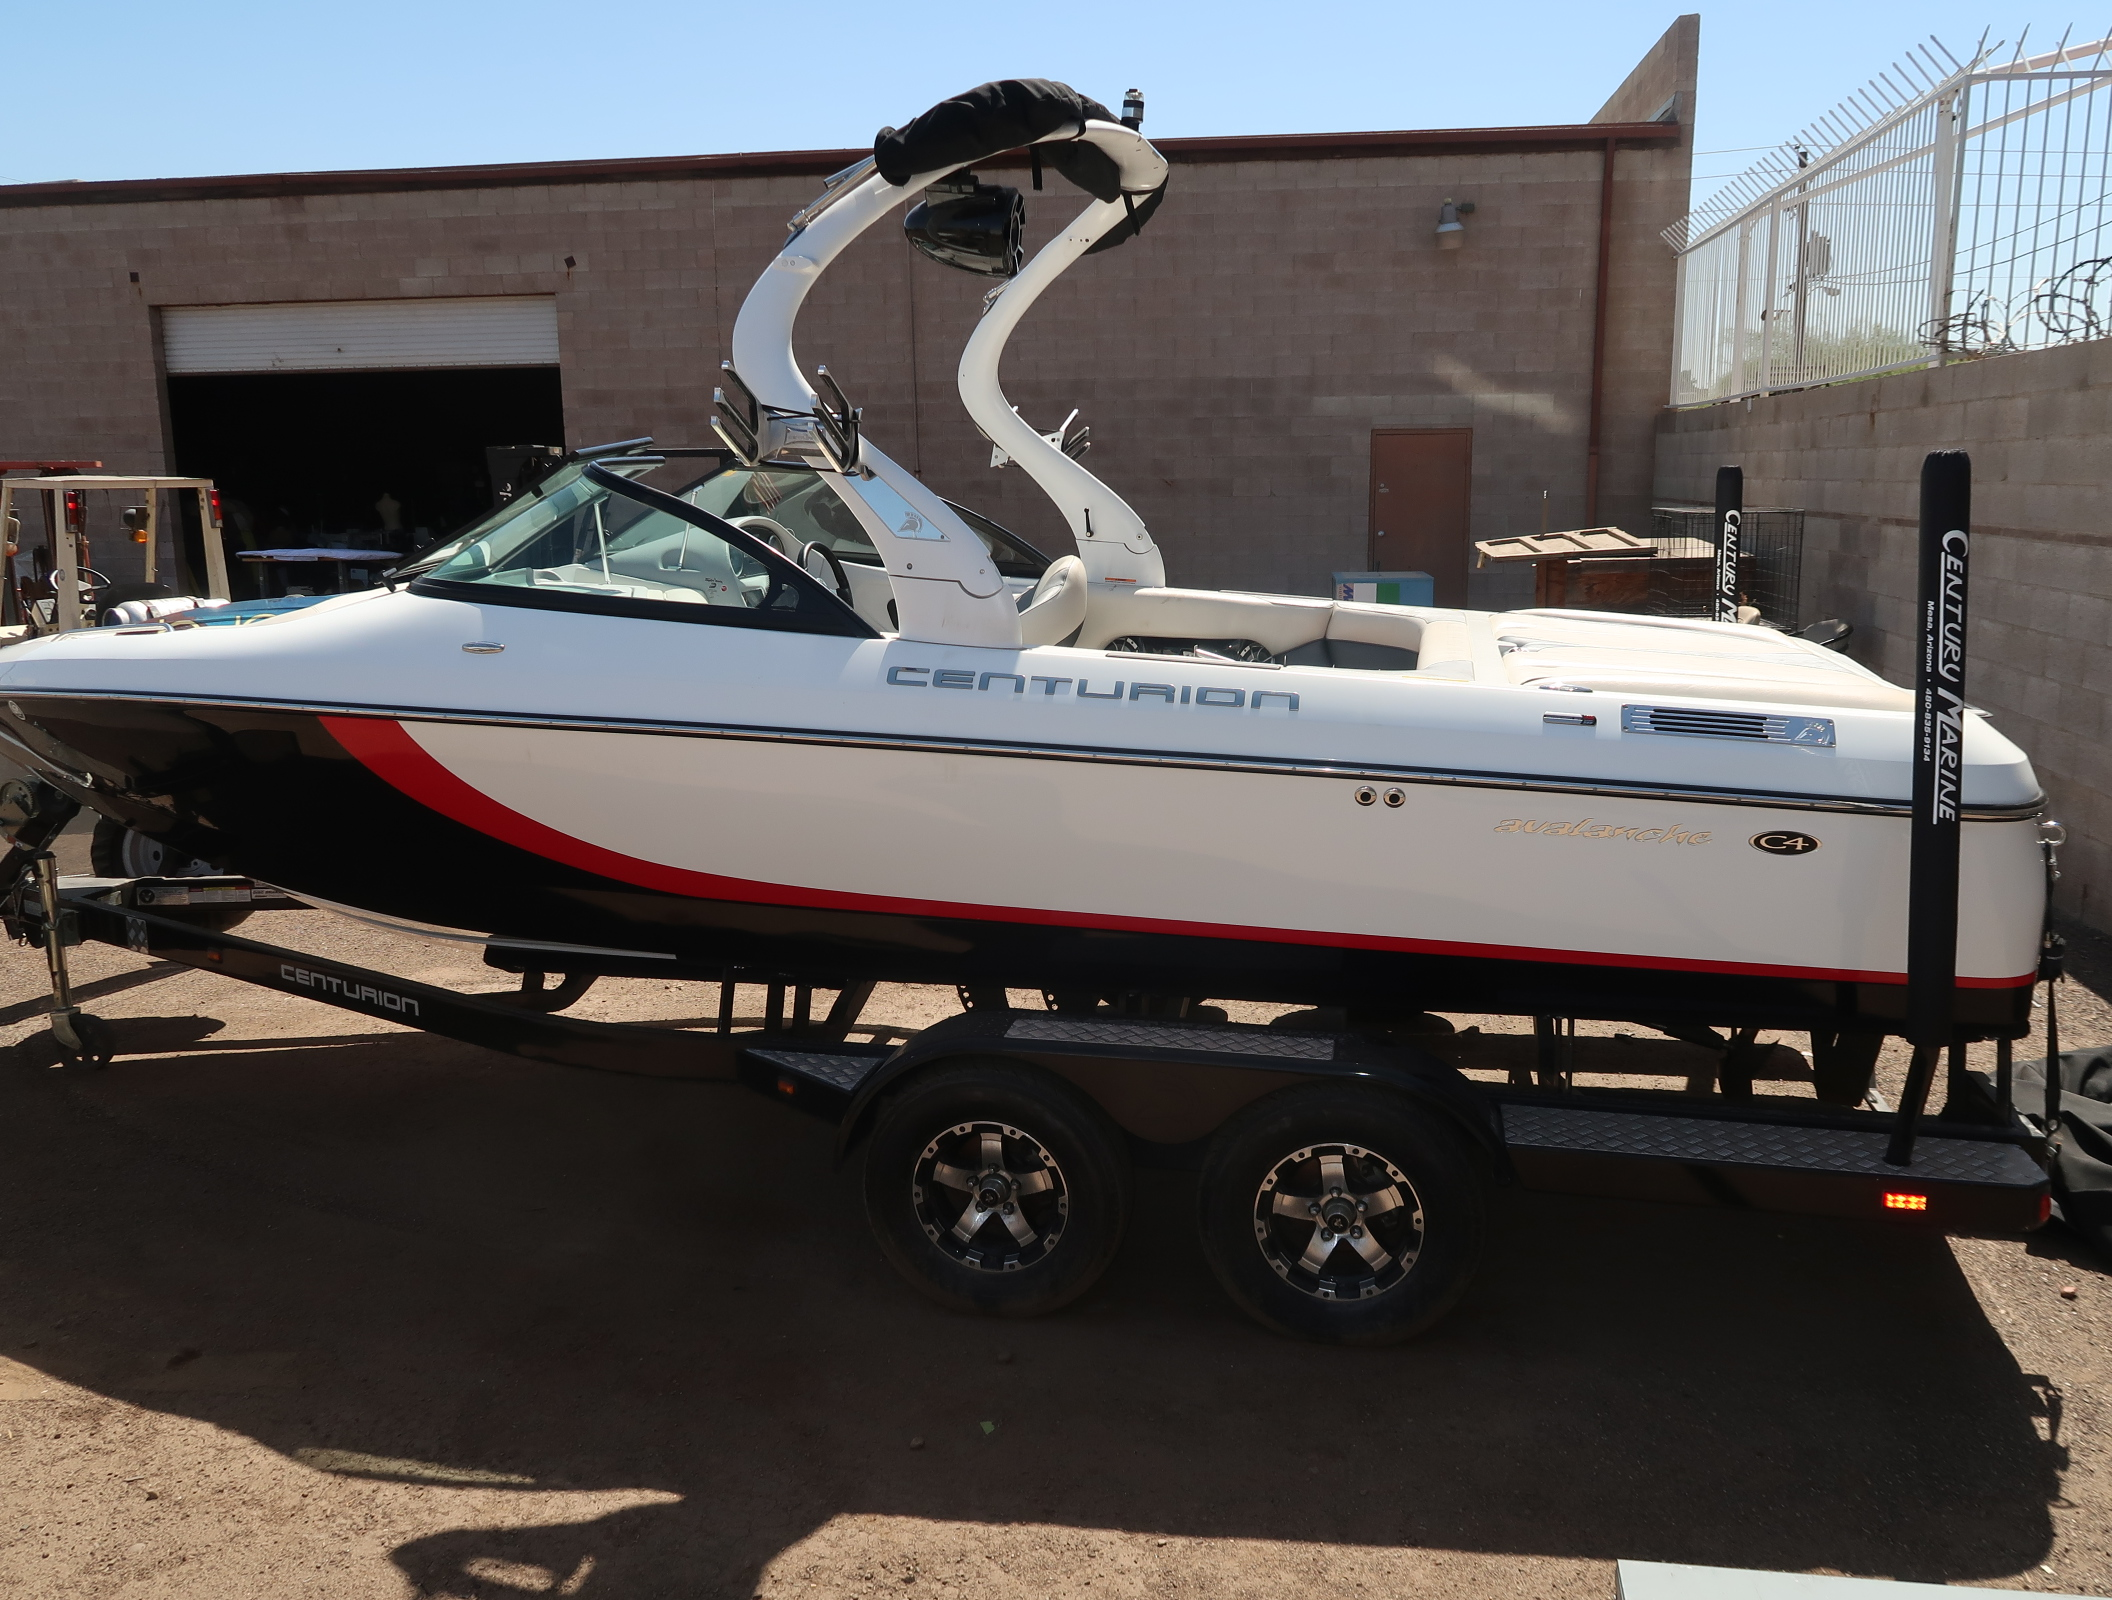 Centurian Avalanche C4 2013 Tow Boat W Wake Board Racks Tow Bar Pcm Ex 343 5 7l 350 Catanium